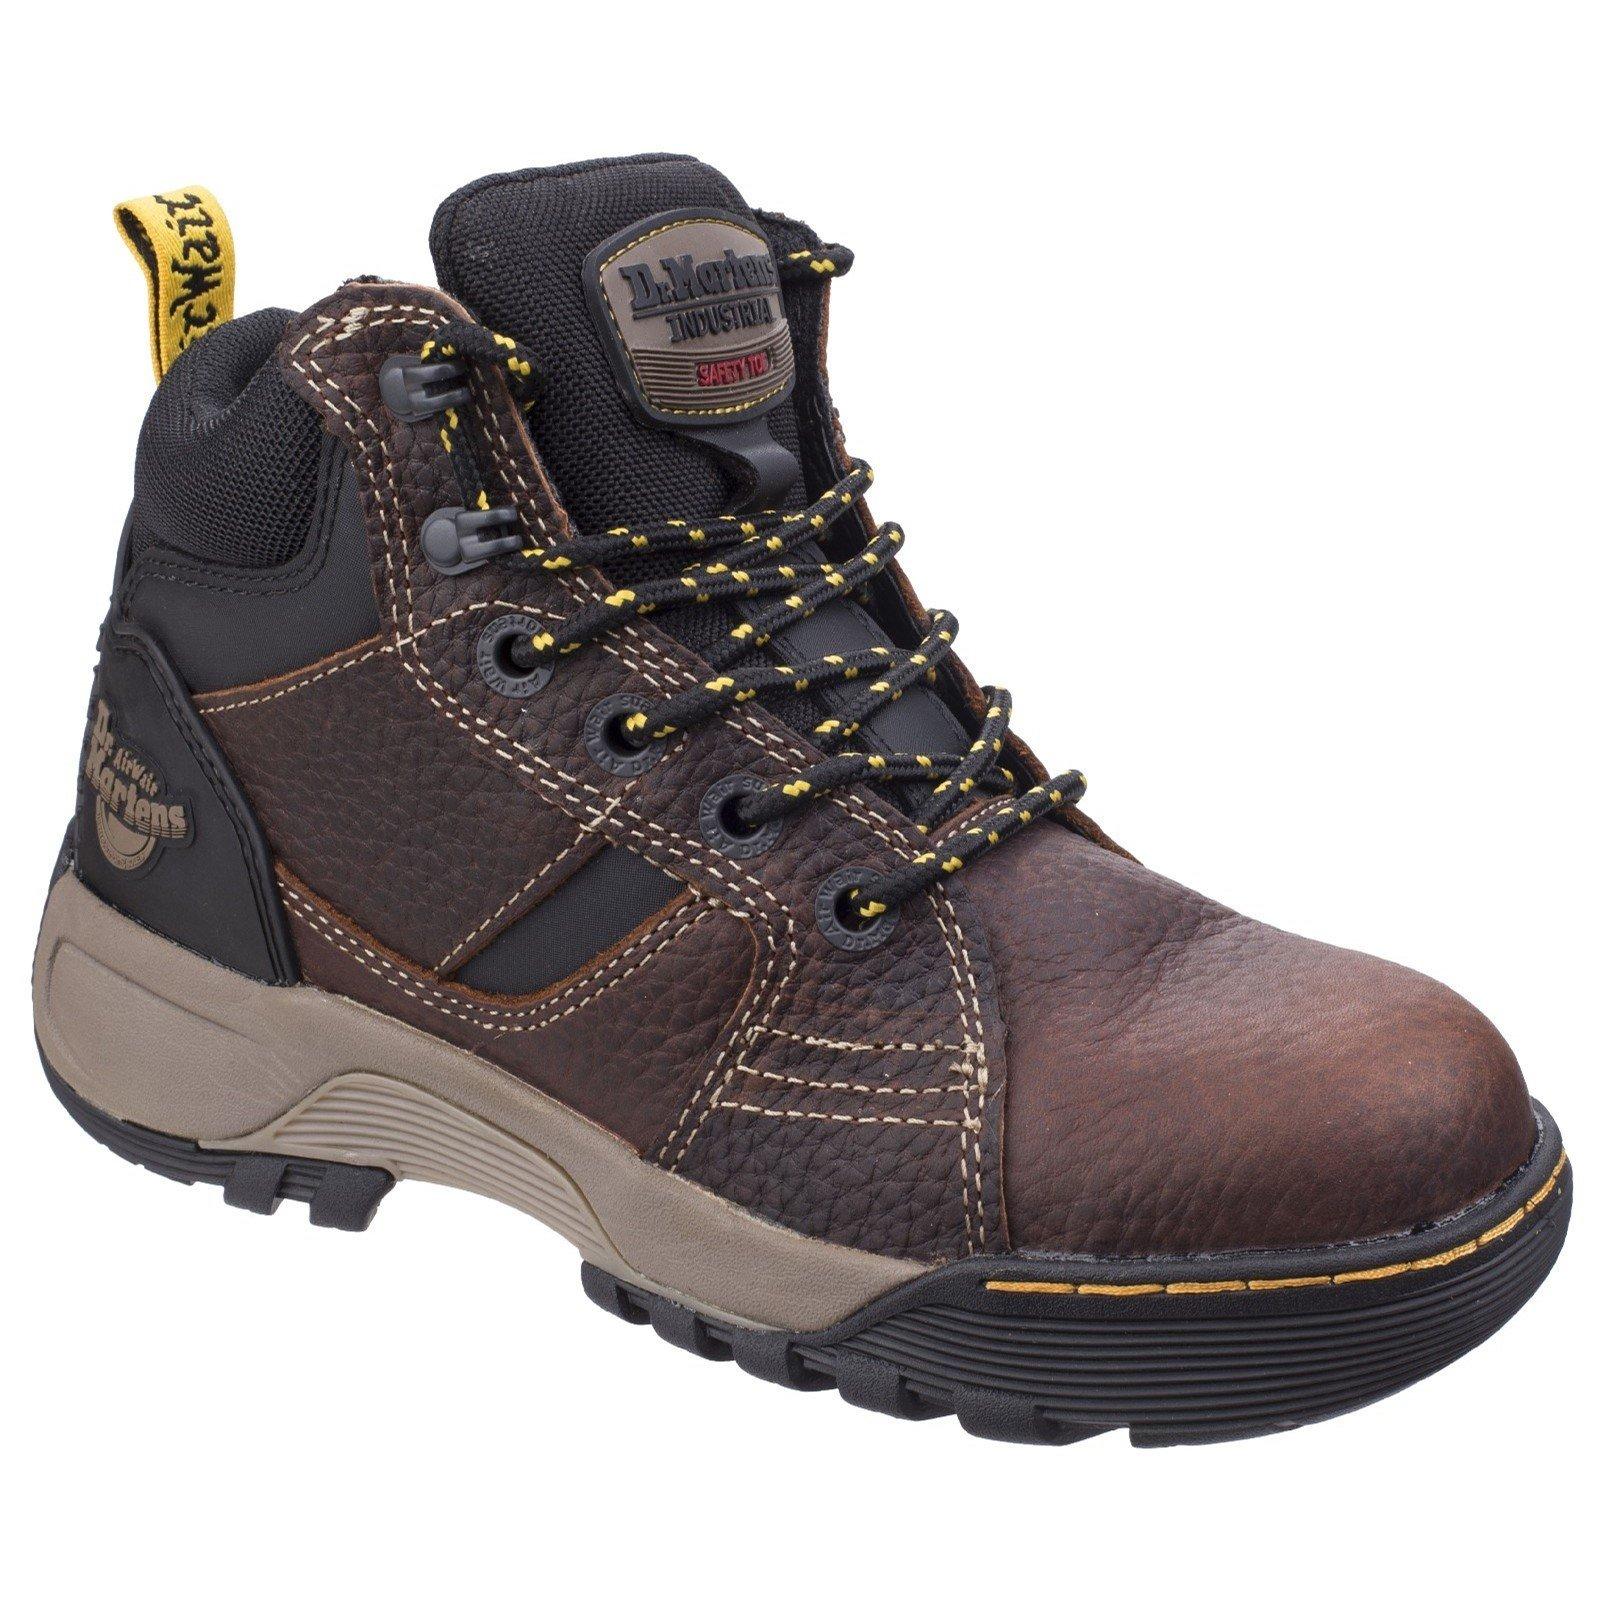 Dr Martens Men's Grapple Safety Boot Various Colours 26023 - Teak 9